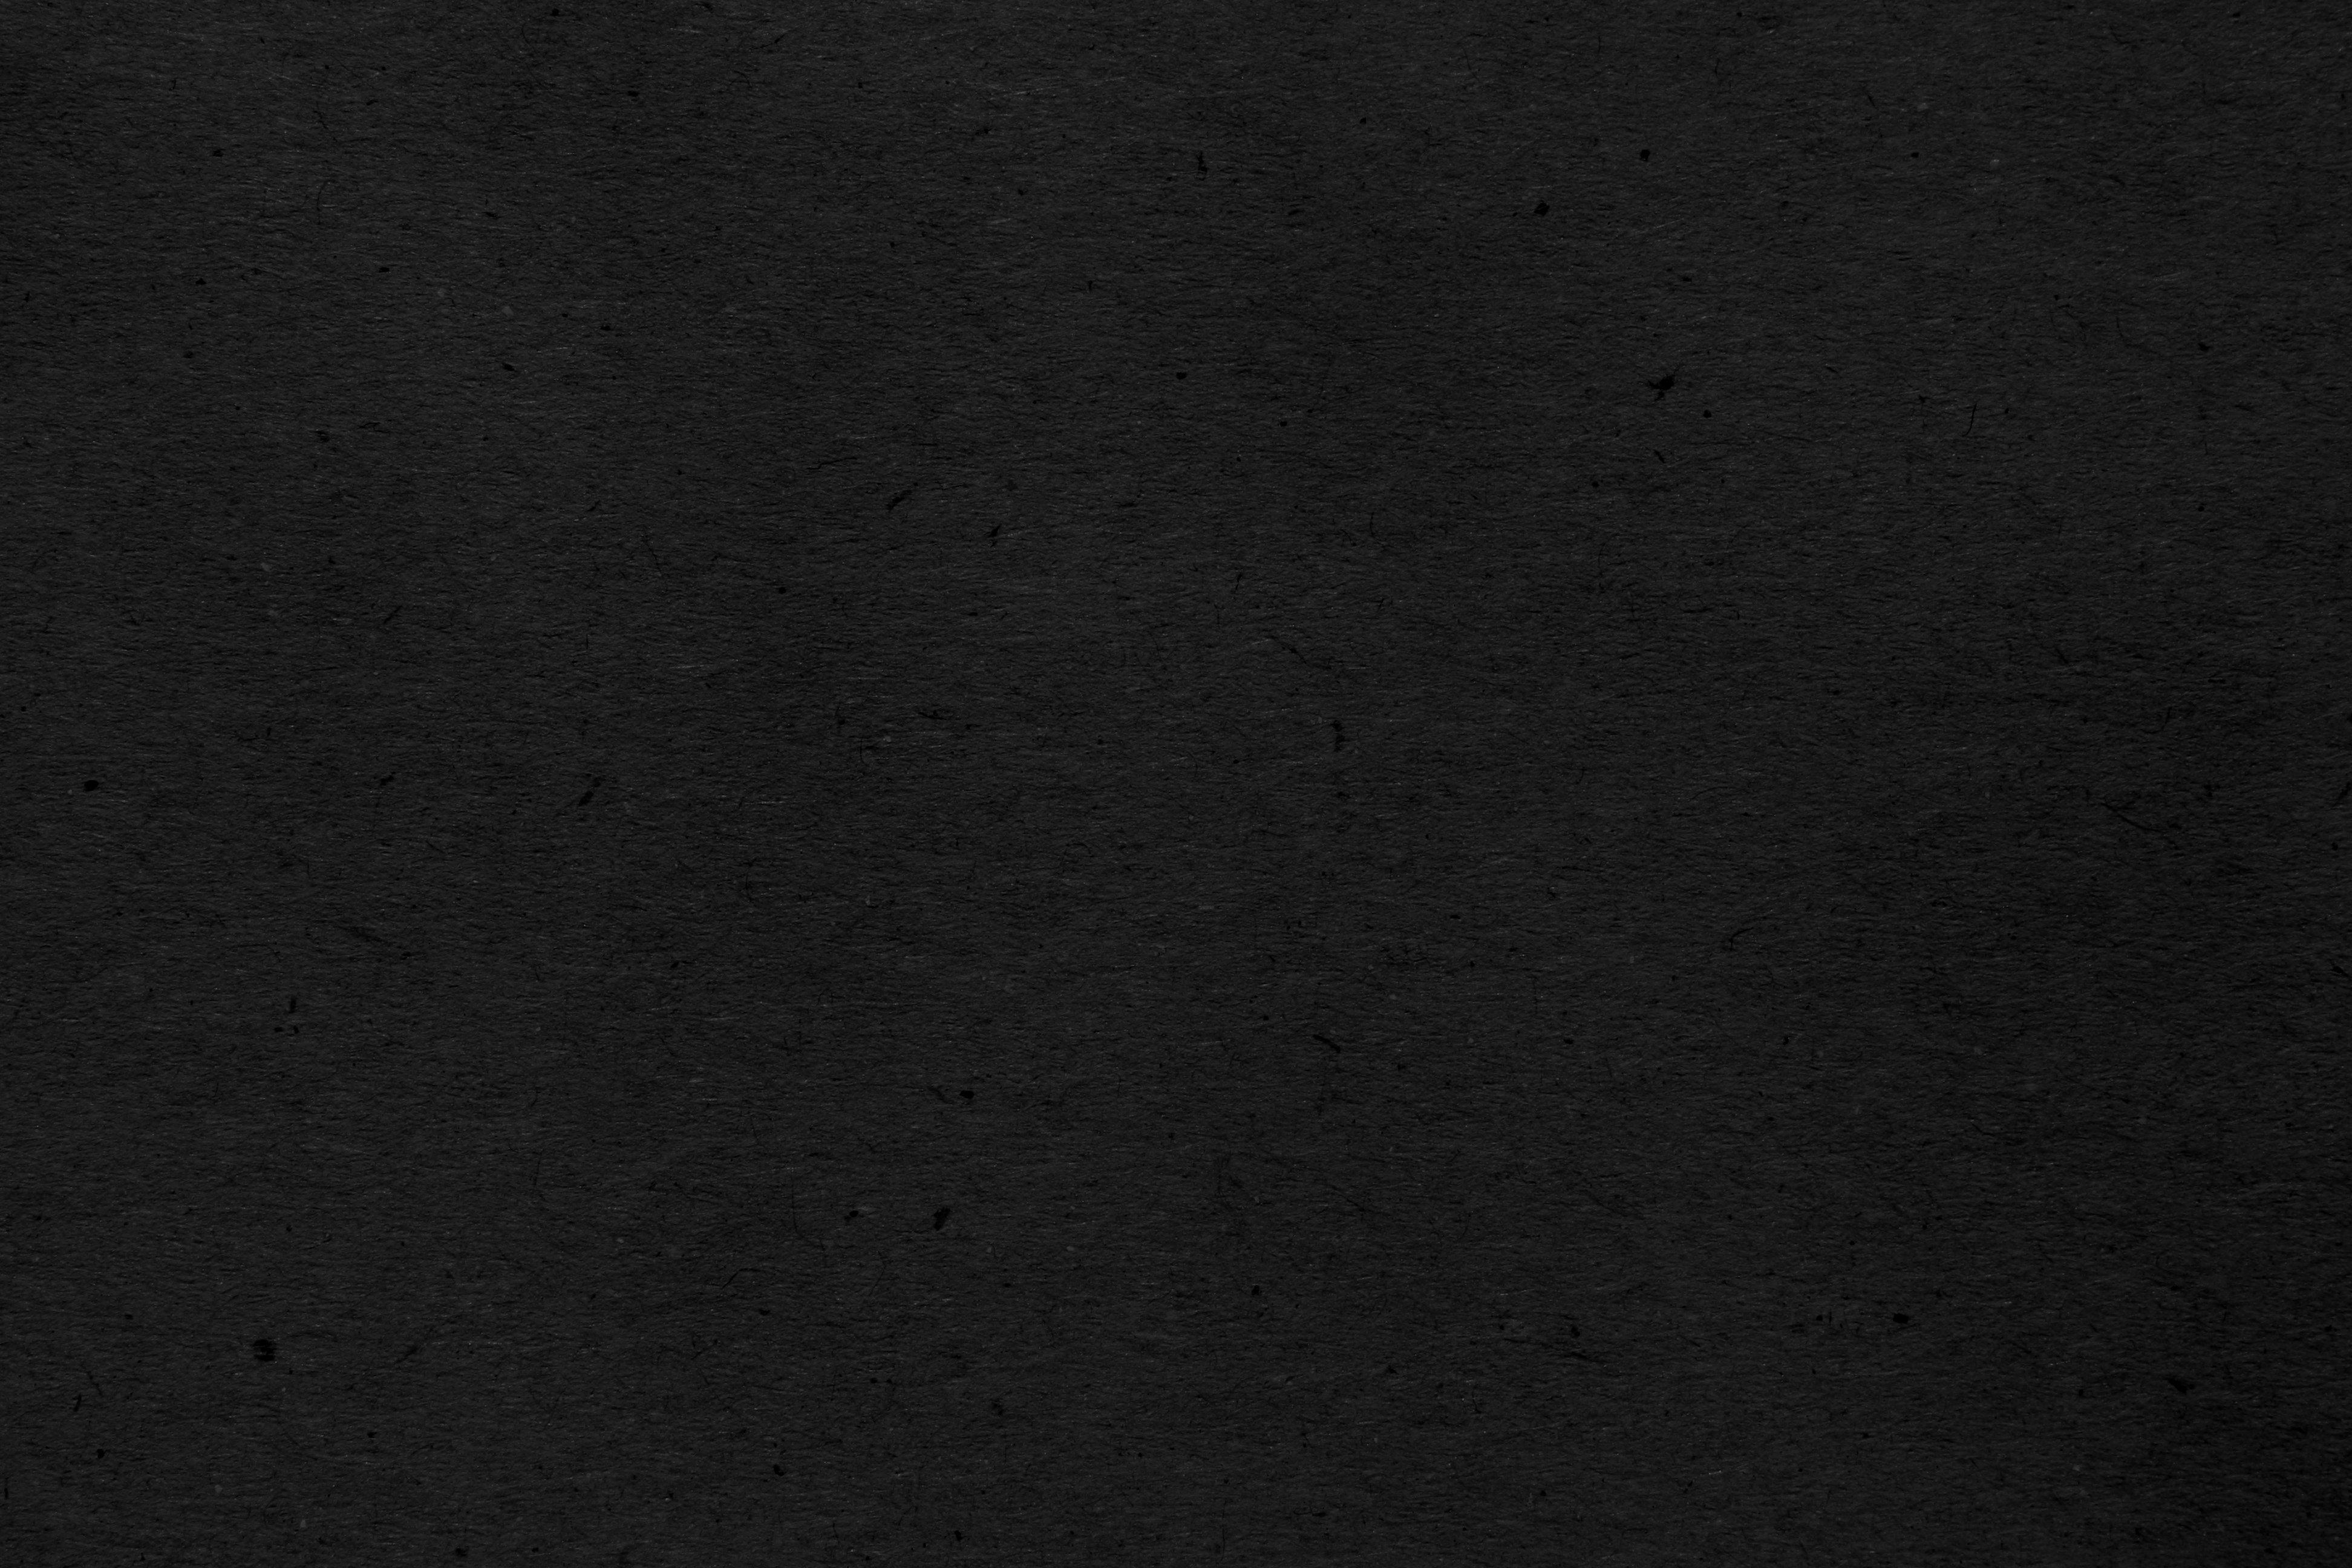 black-paper-texture.jpg